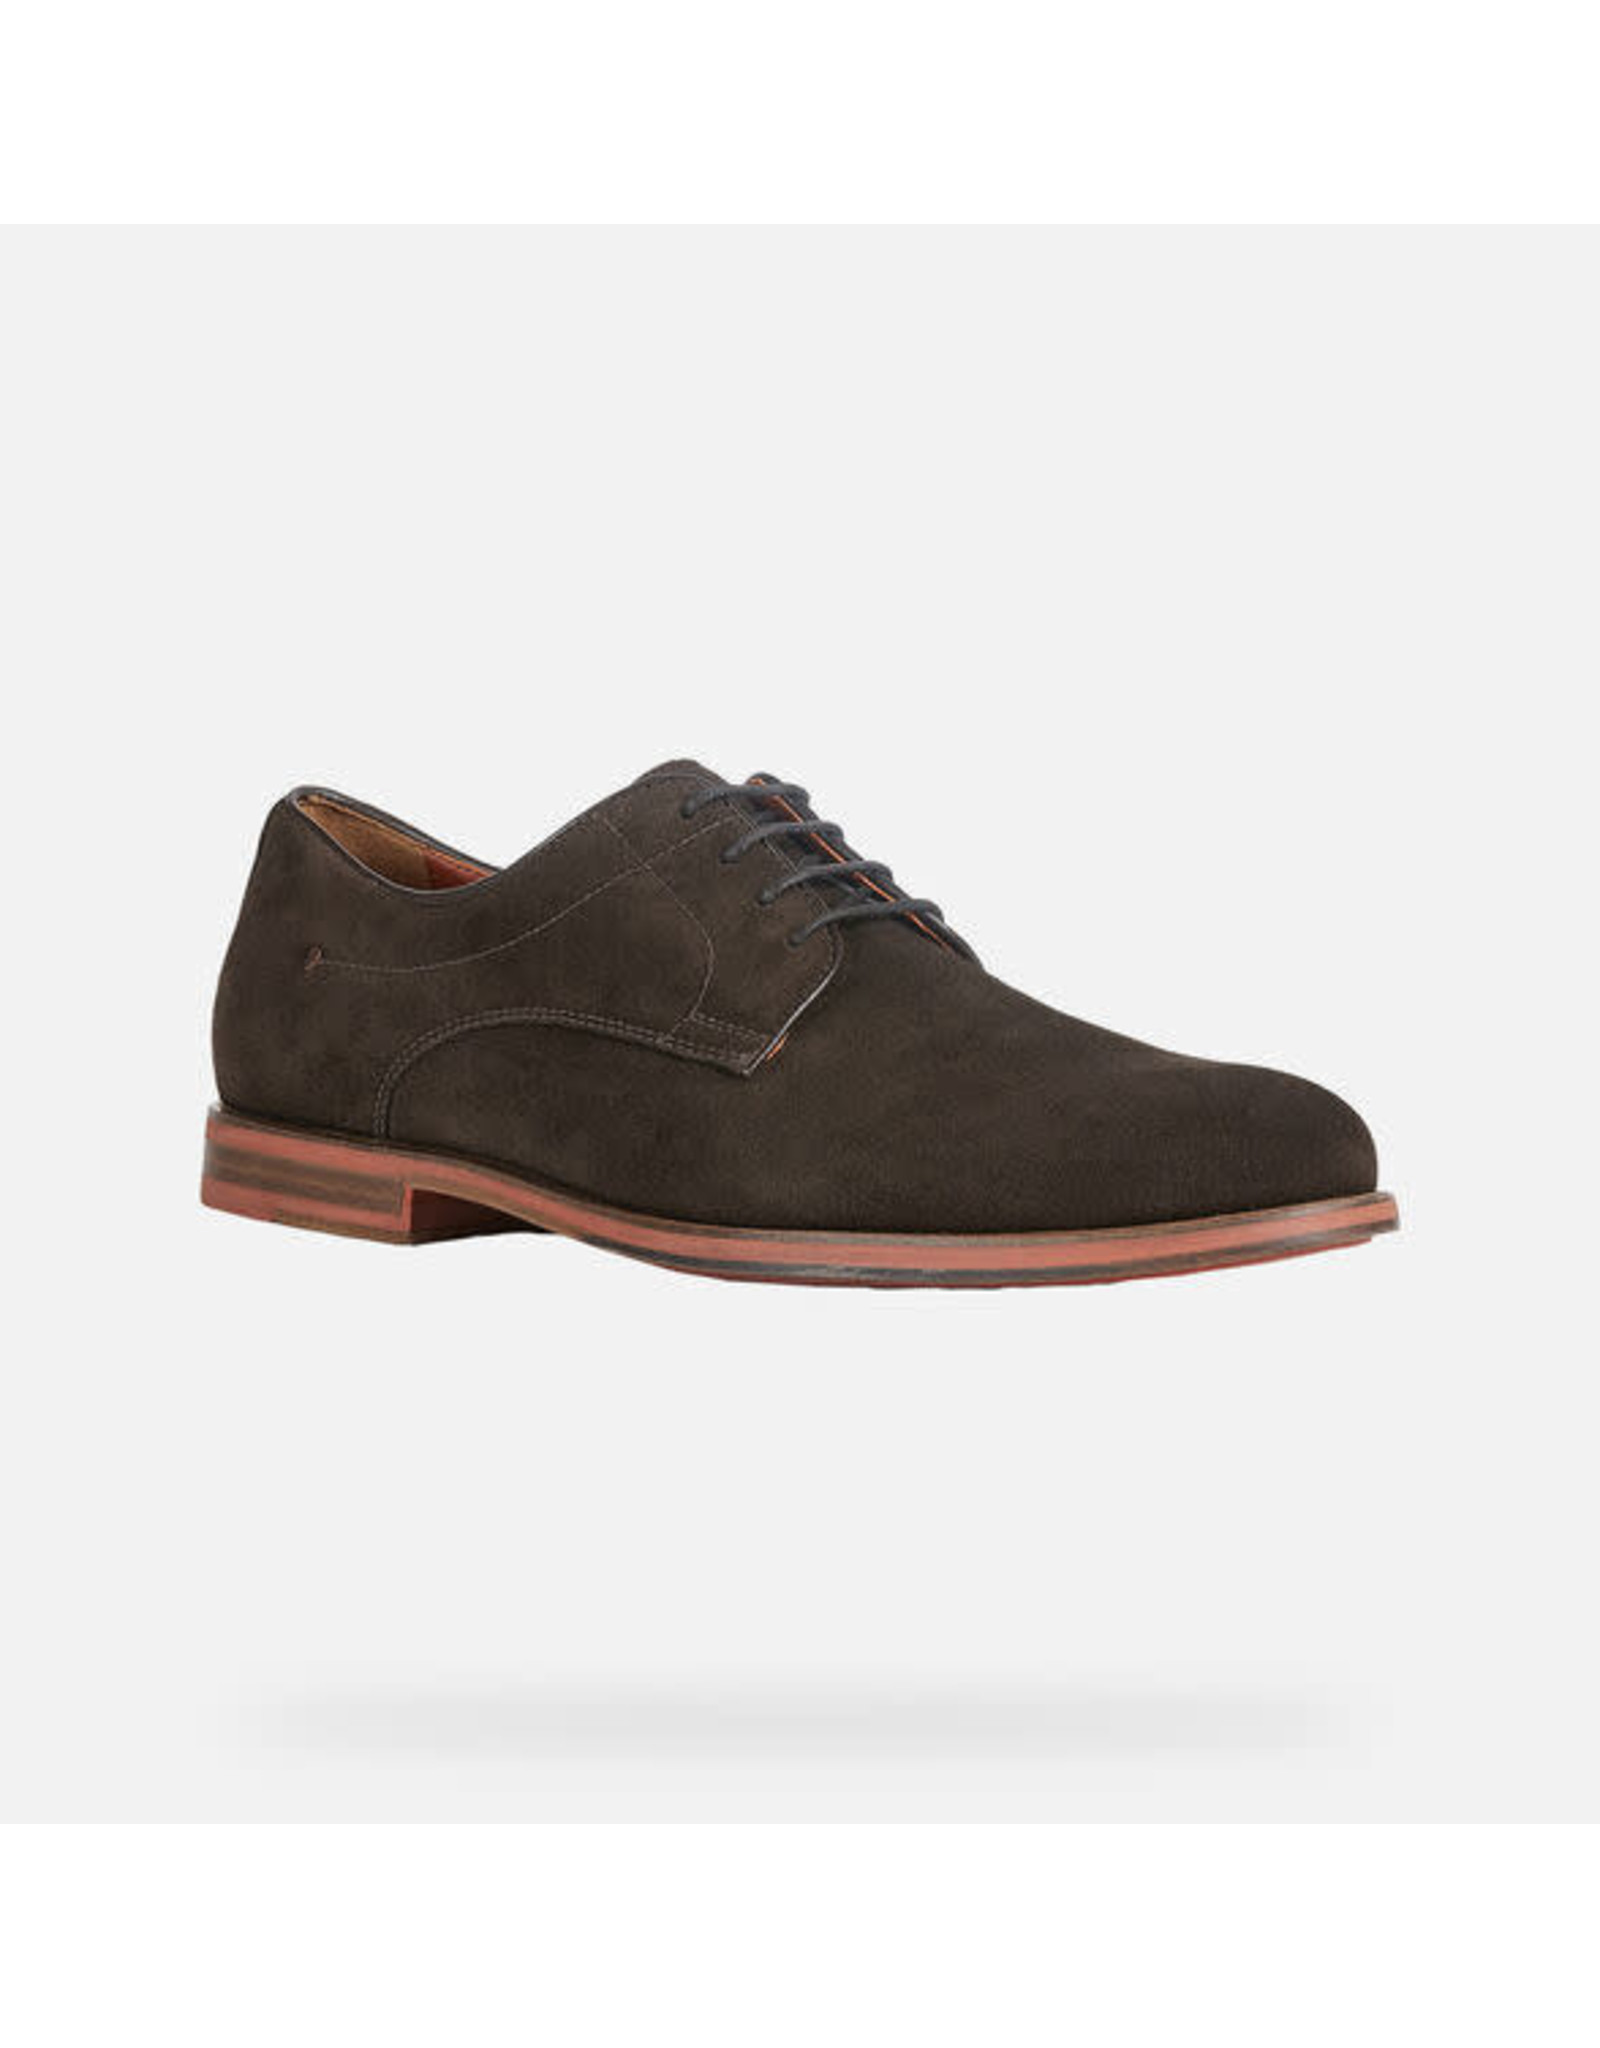 Geox Bayle Brown Shoe